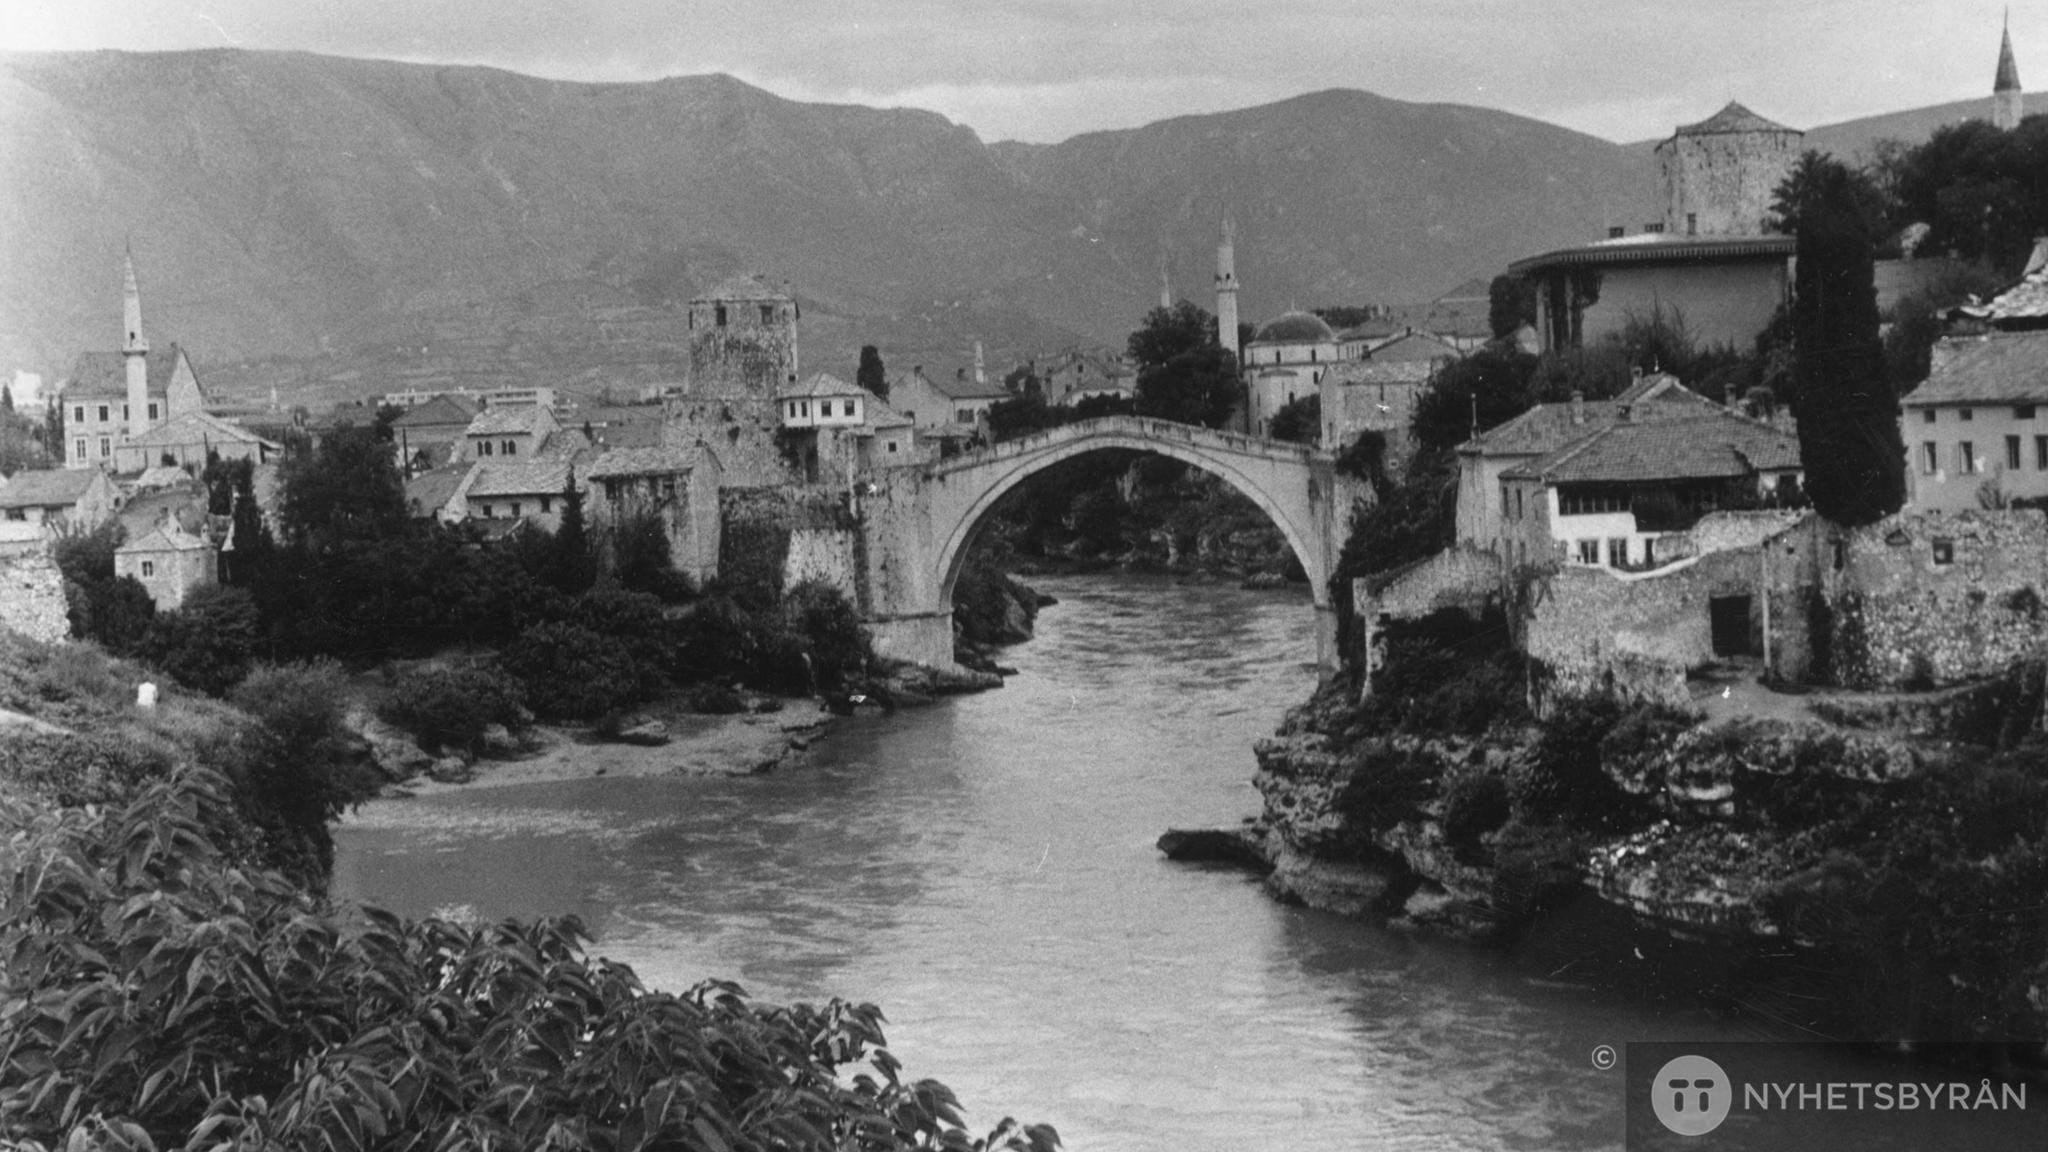 Slaget om Mostar